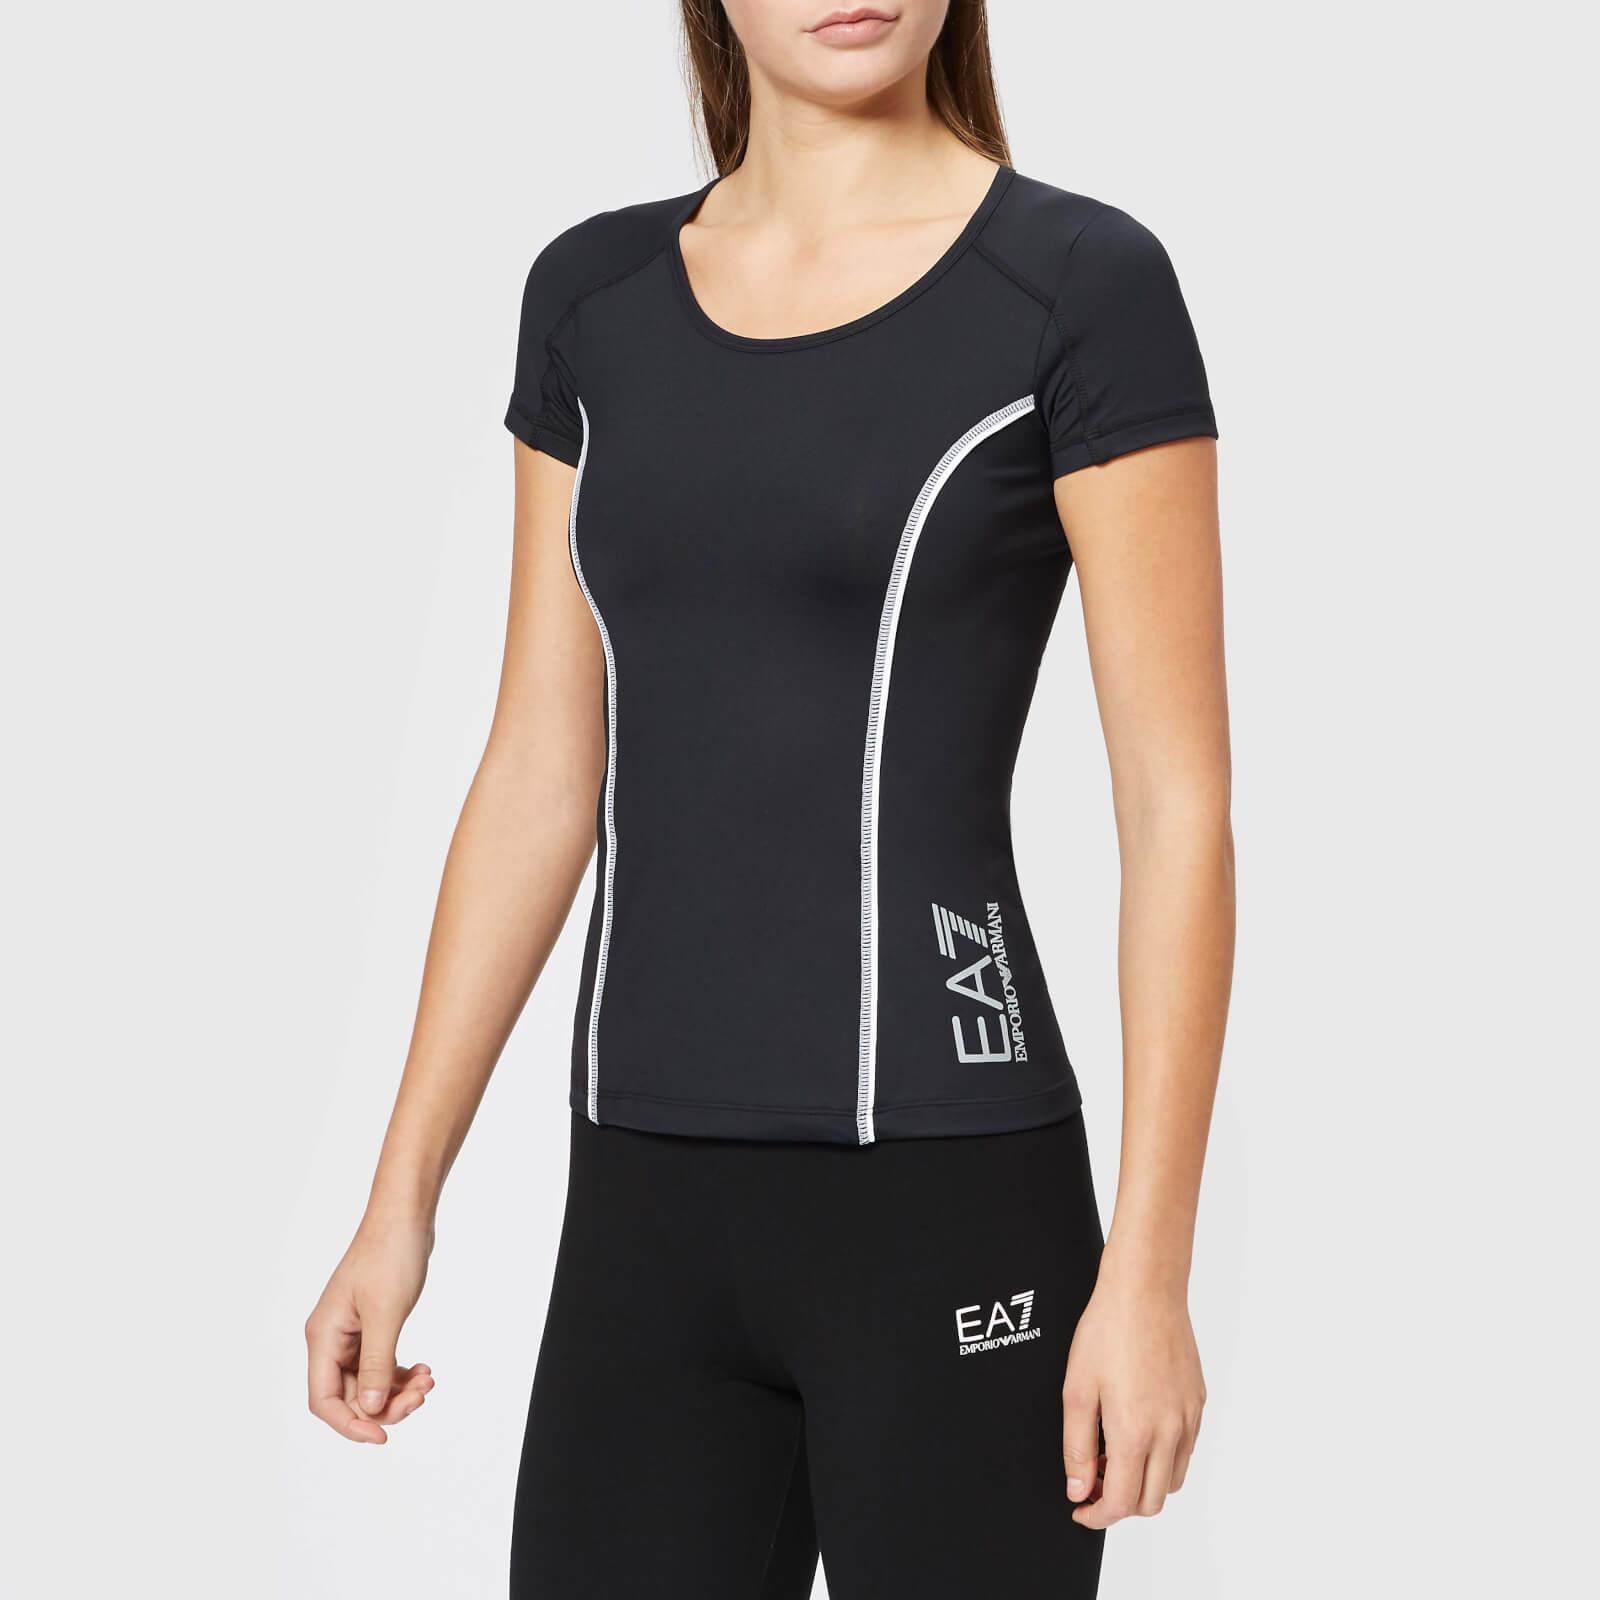 b93e271b5cc9 Emporio Armani EA7 Women's Round Neck T-Shirt - Black Sports & Leisure |  TheHut.com